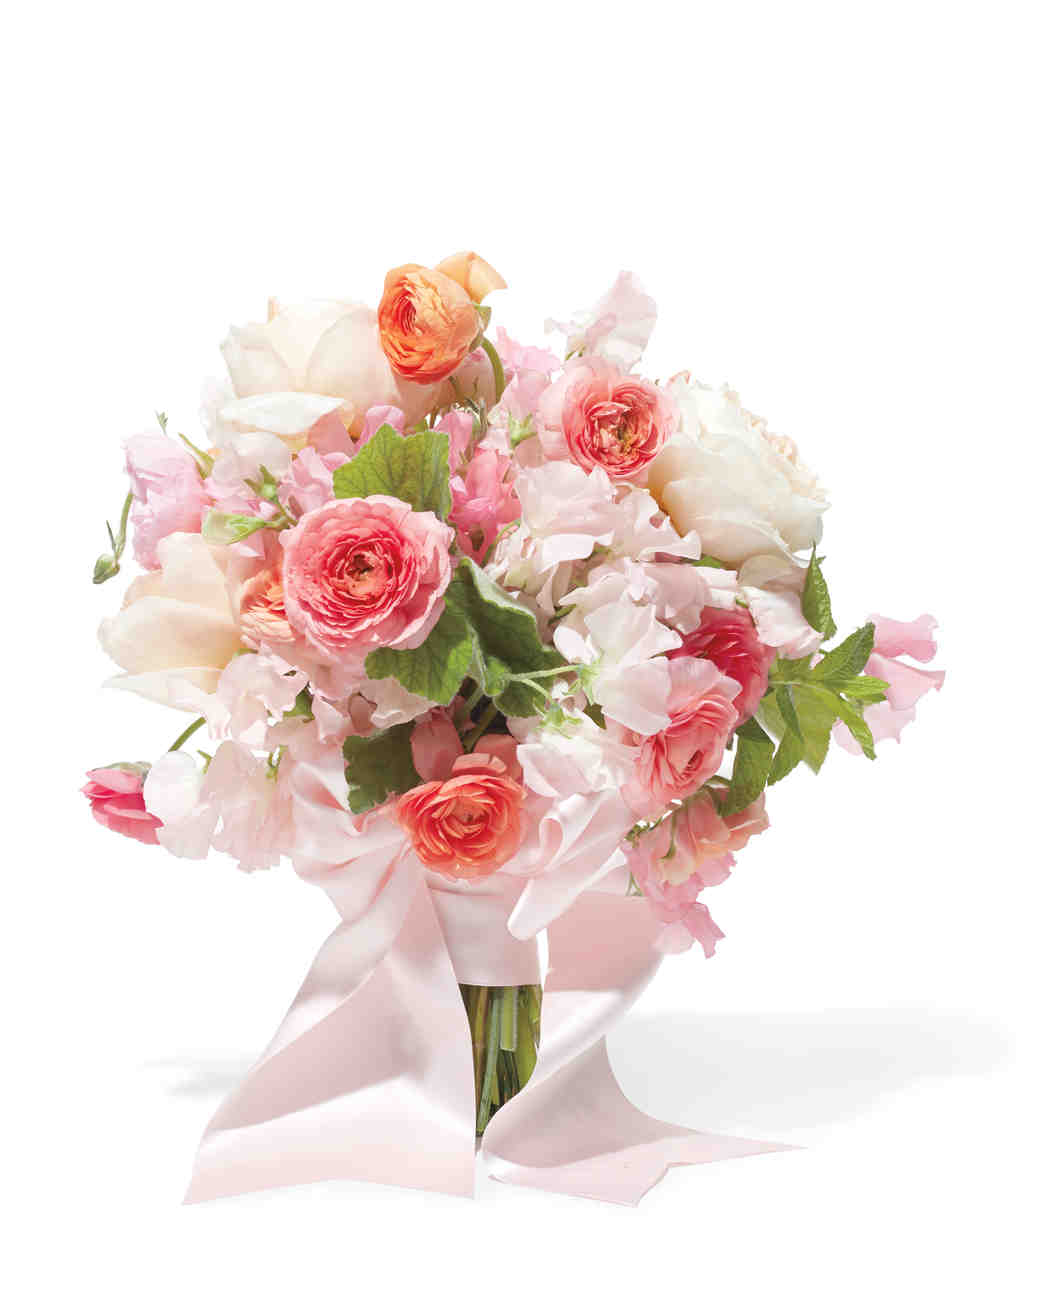 bouquet-136135-comp-mwd110687.jpg